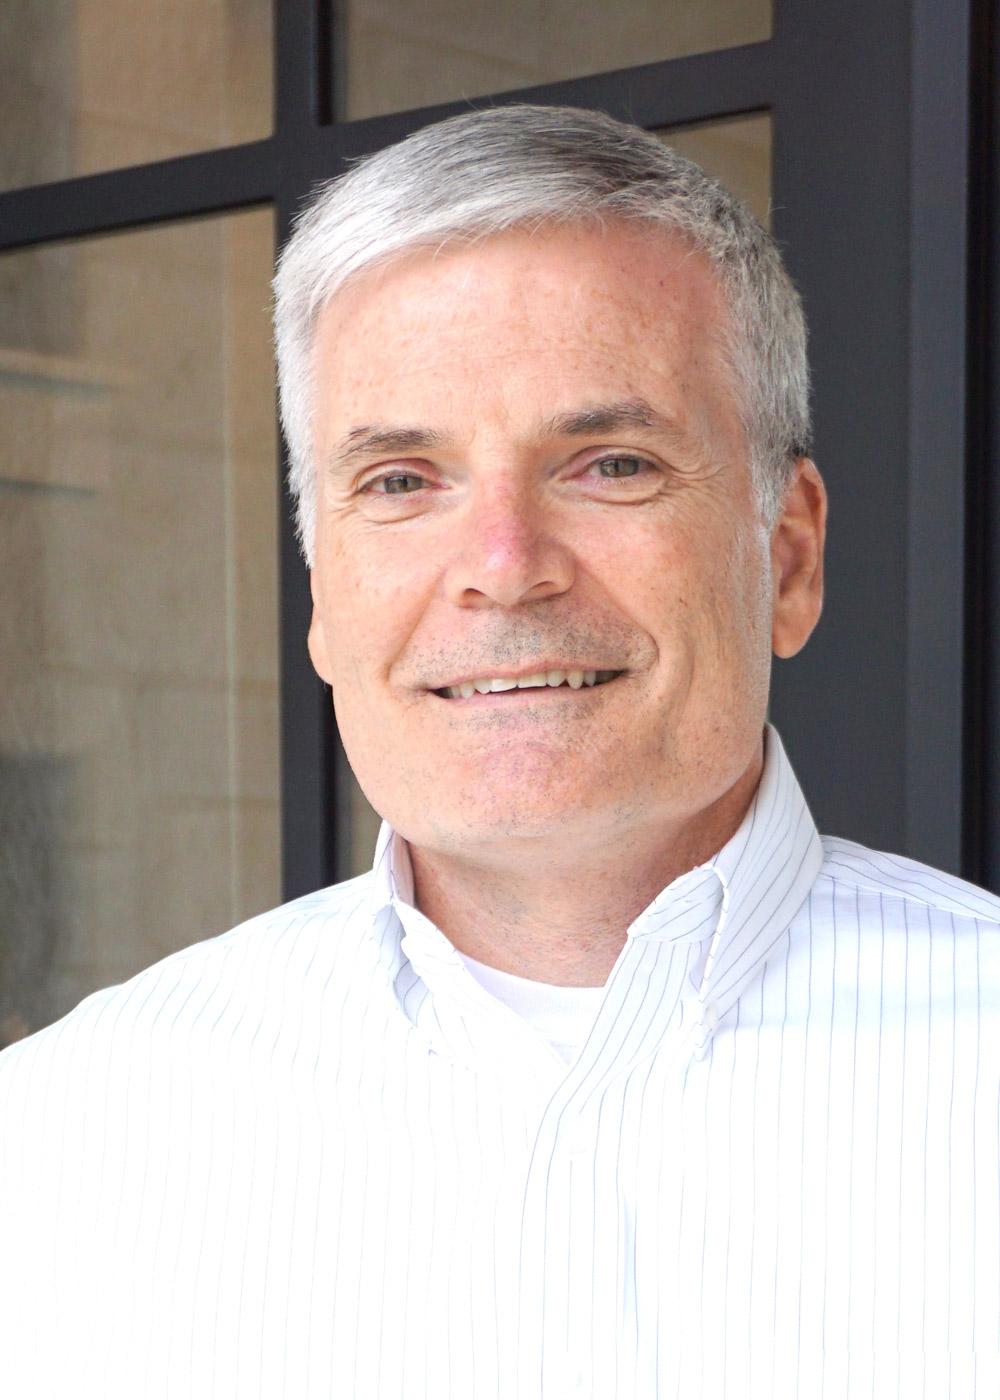 Dean Smith, VP of Sales at Stadler Custom Homes